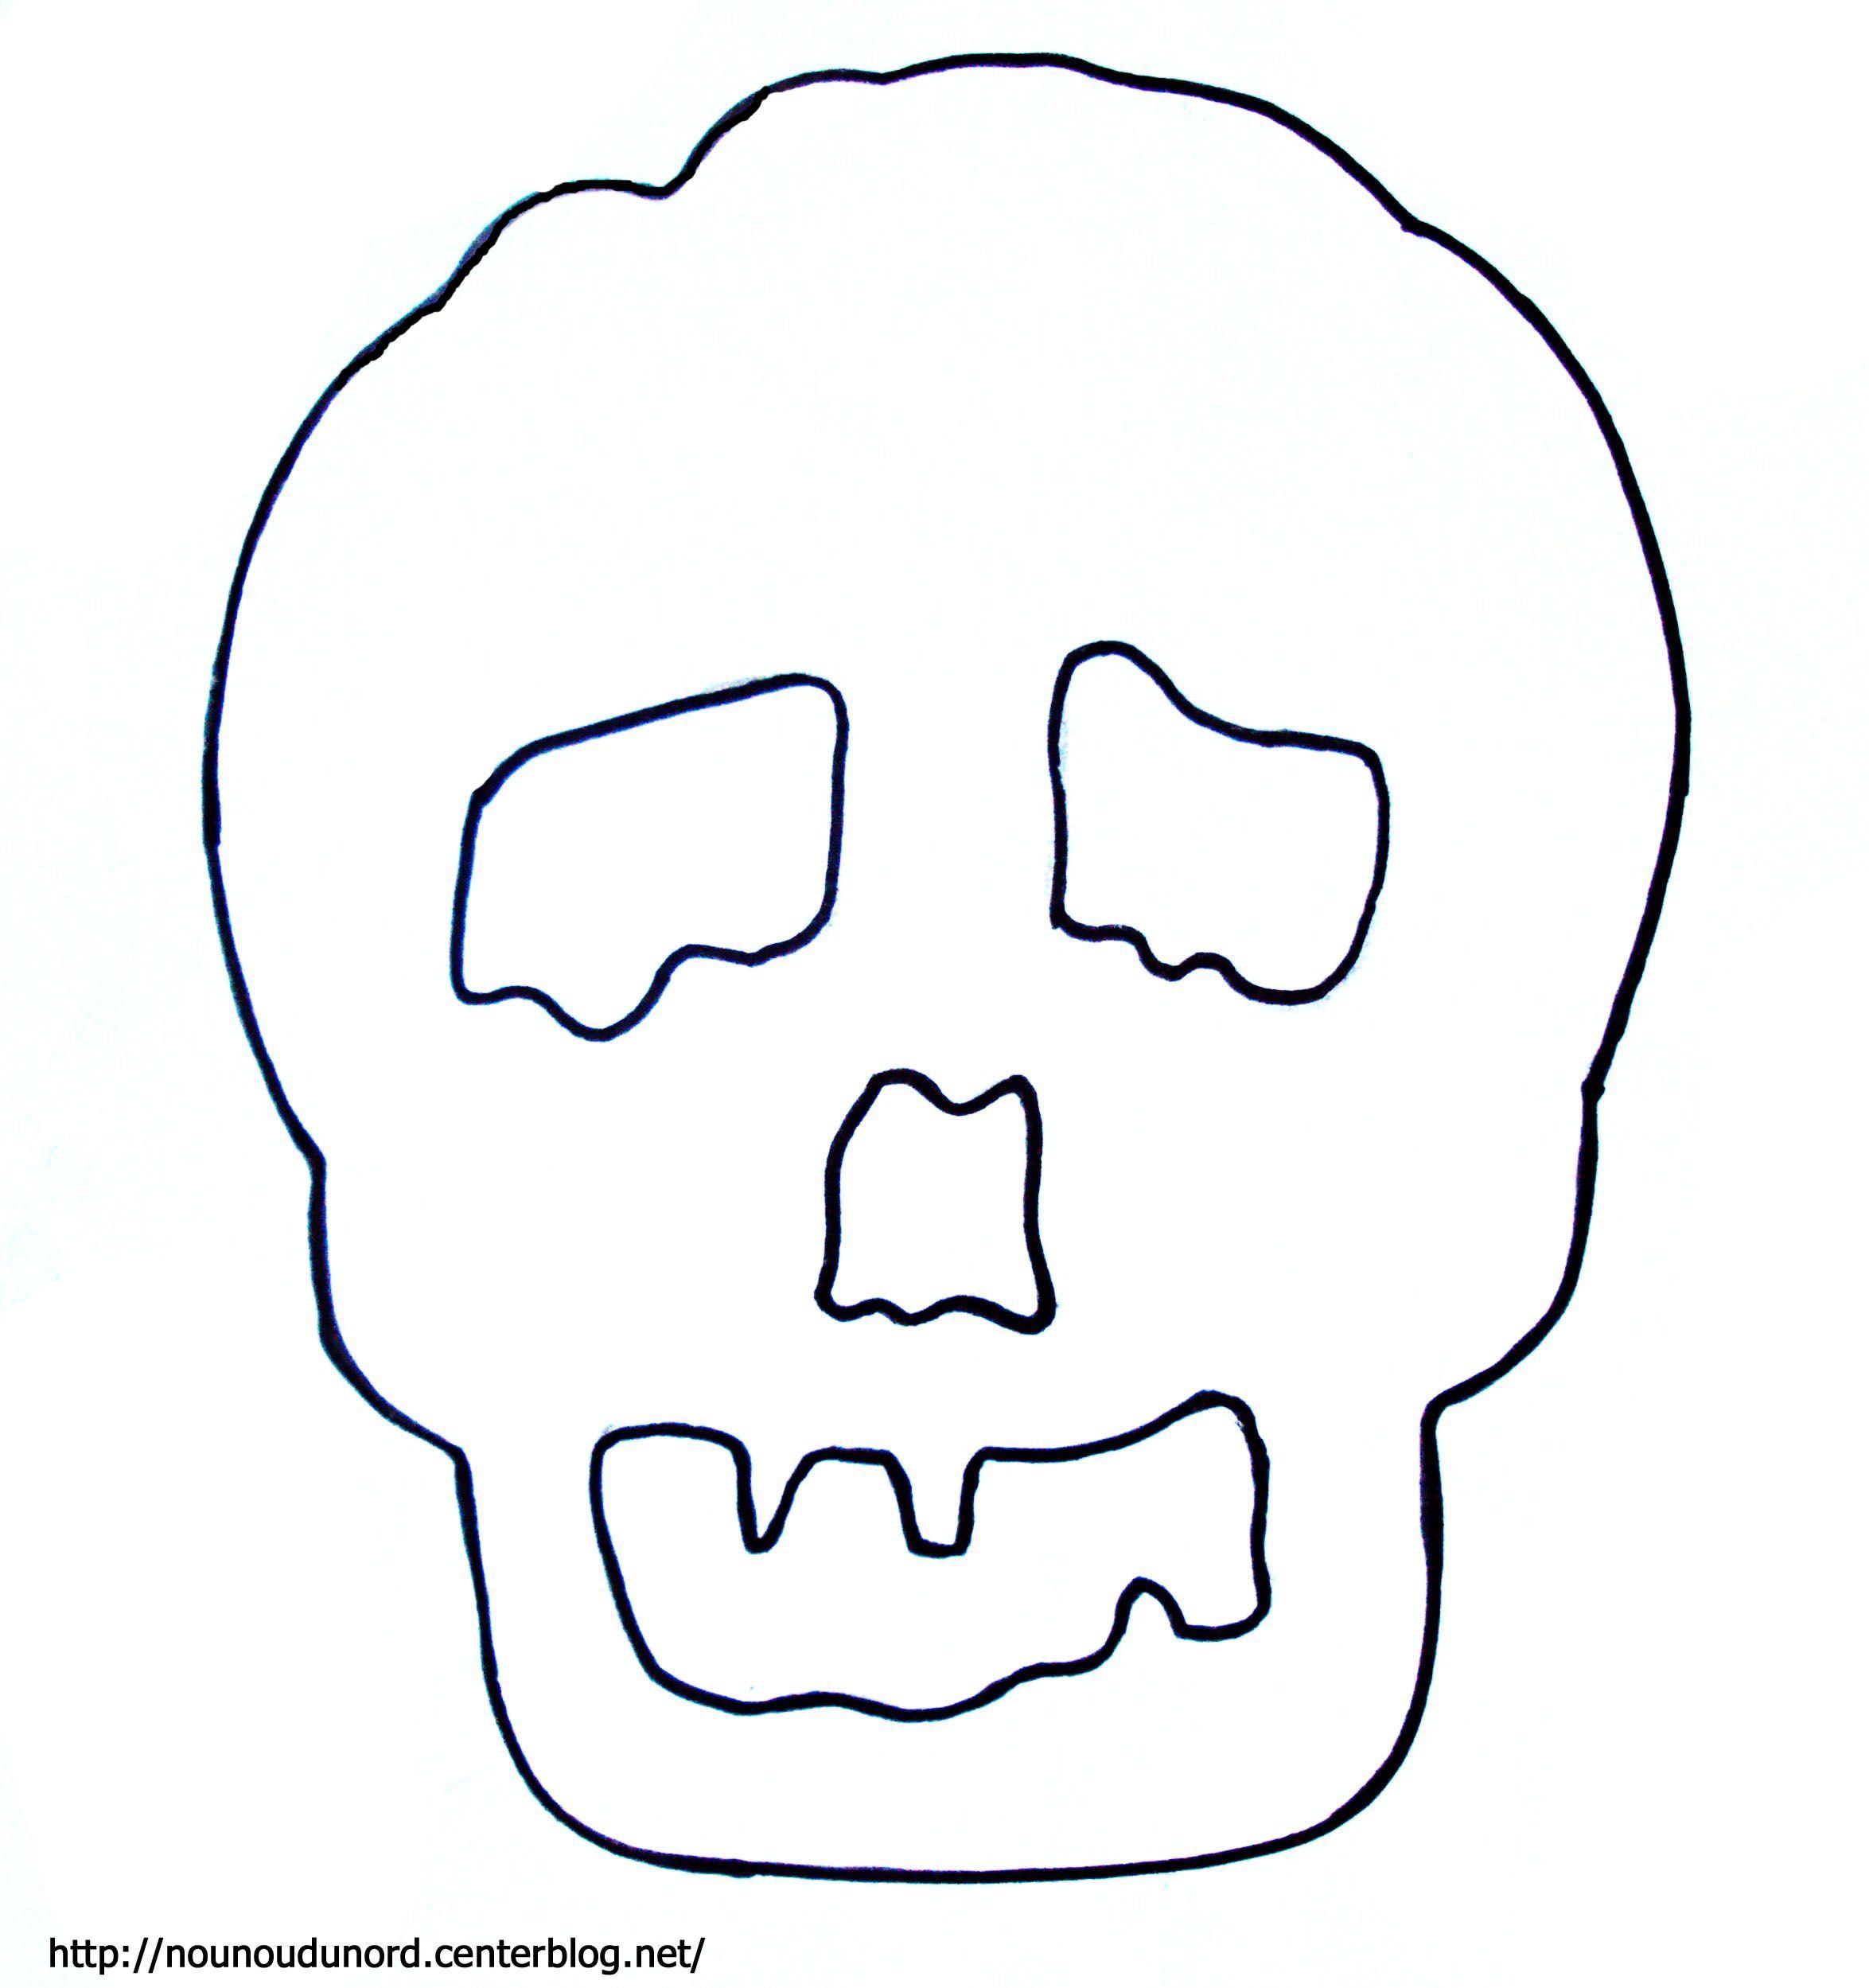 Coloriage t te de mort - Tete de mort coloriage ...